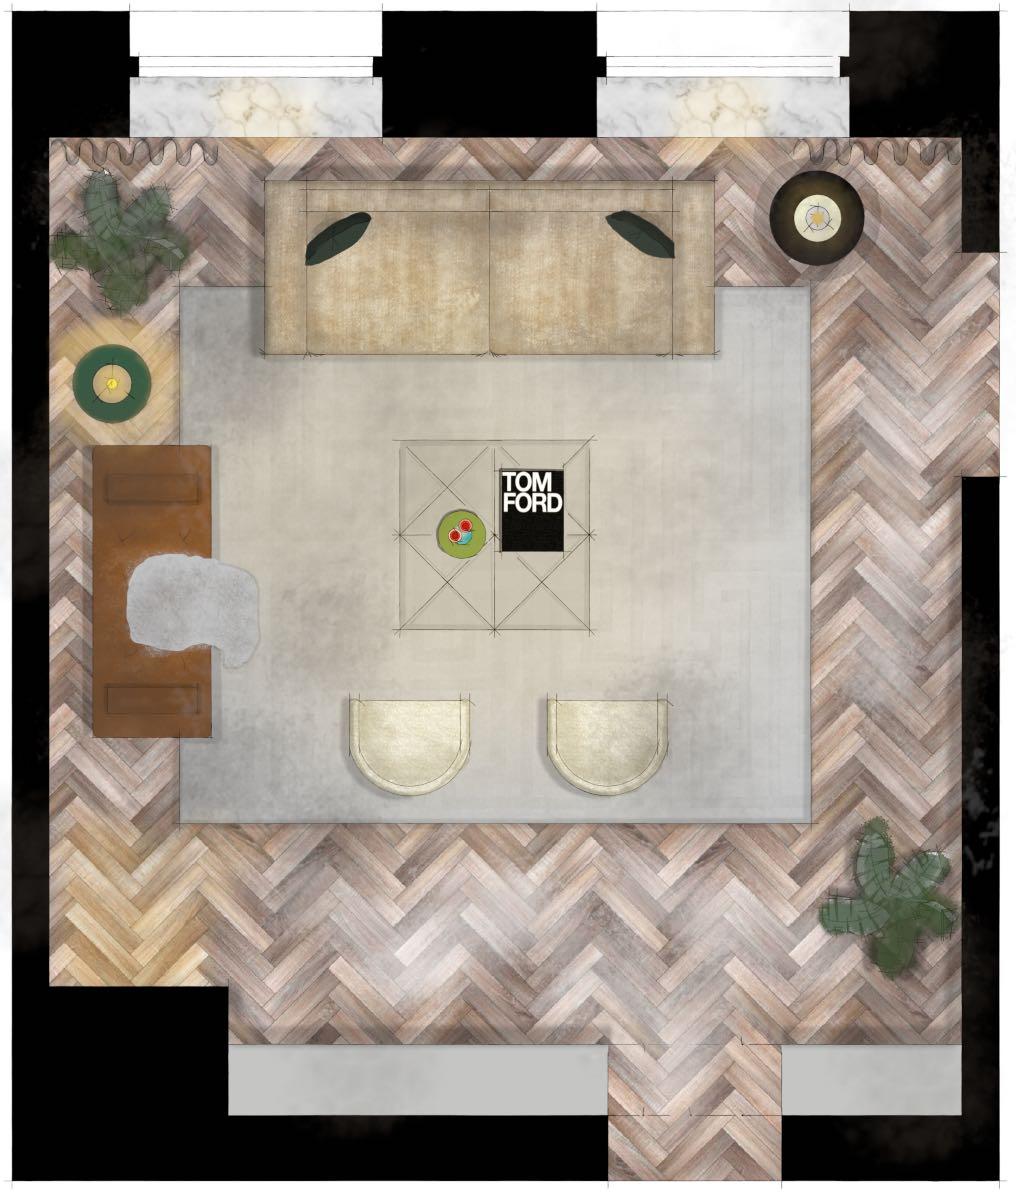 Plan - sketchup